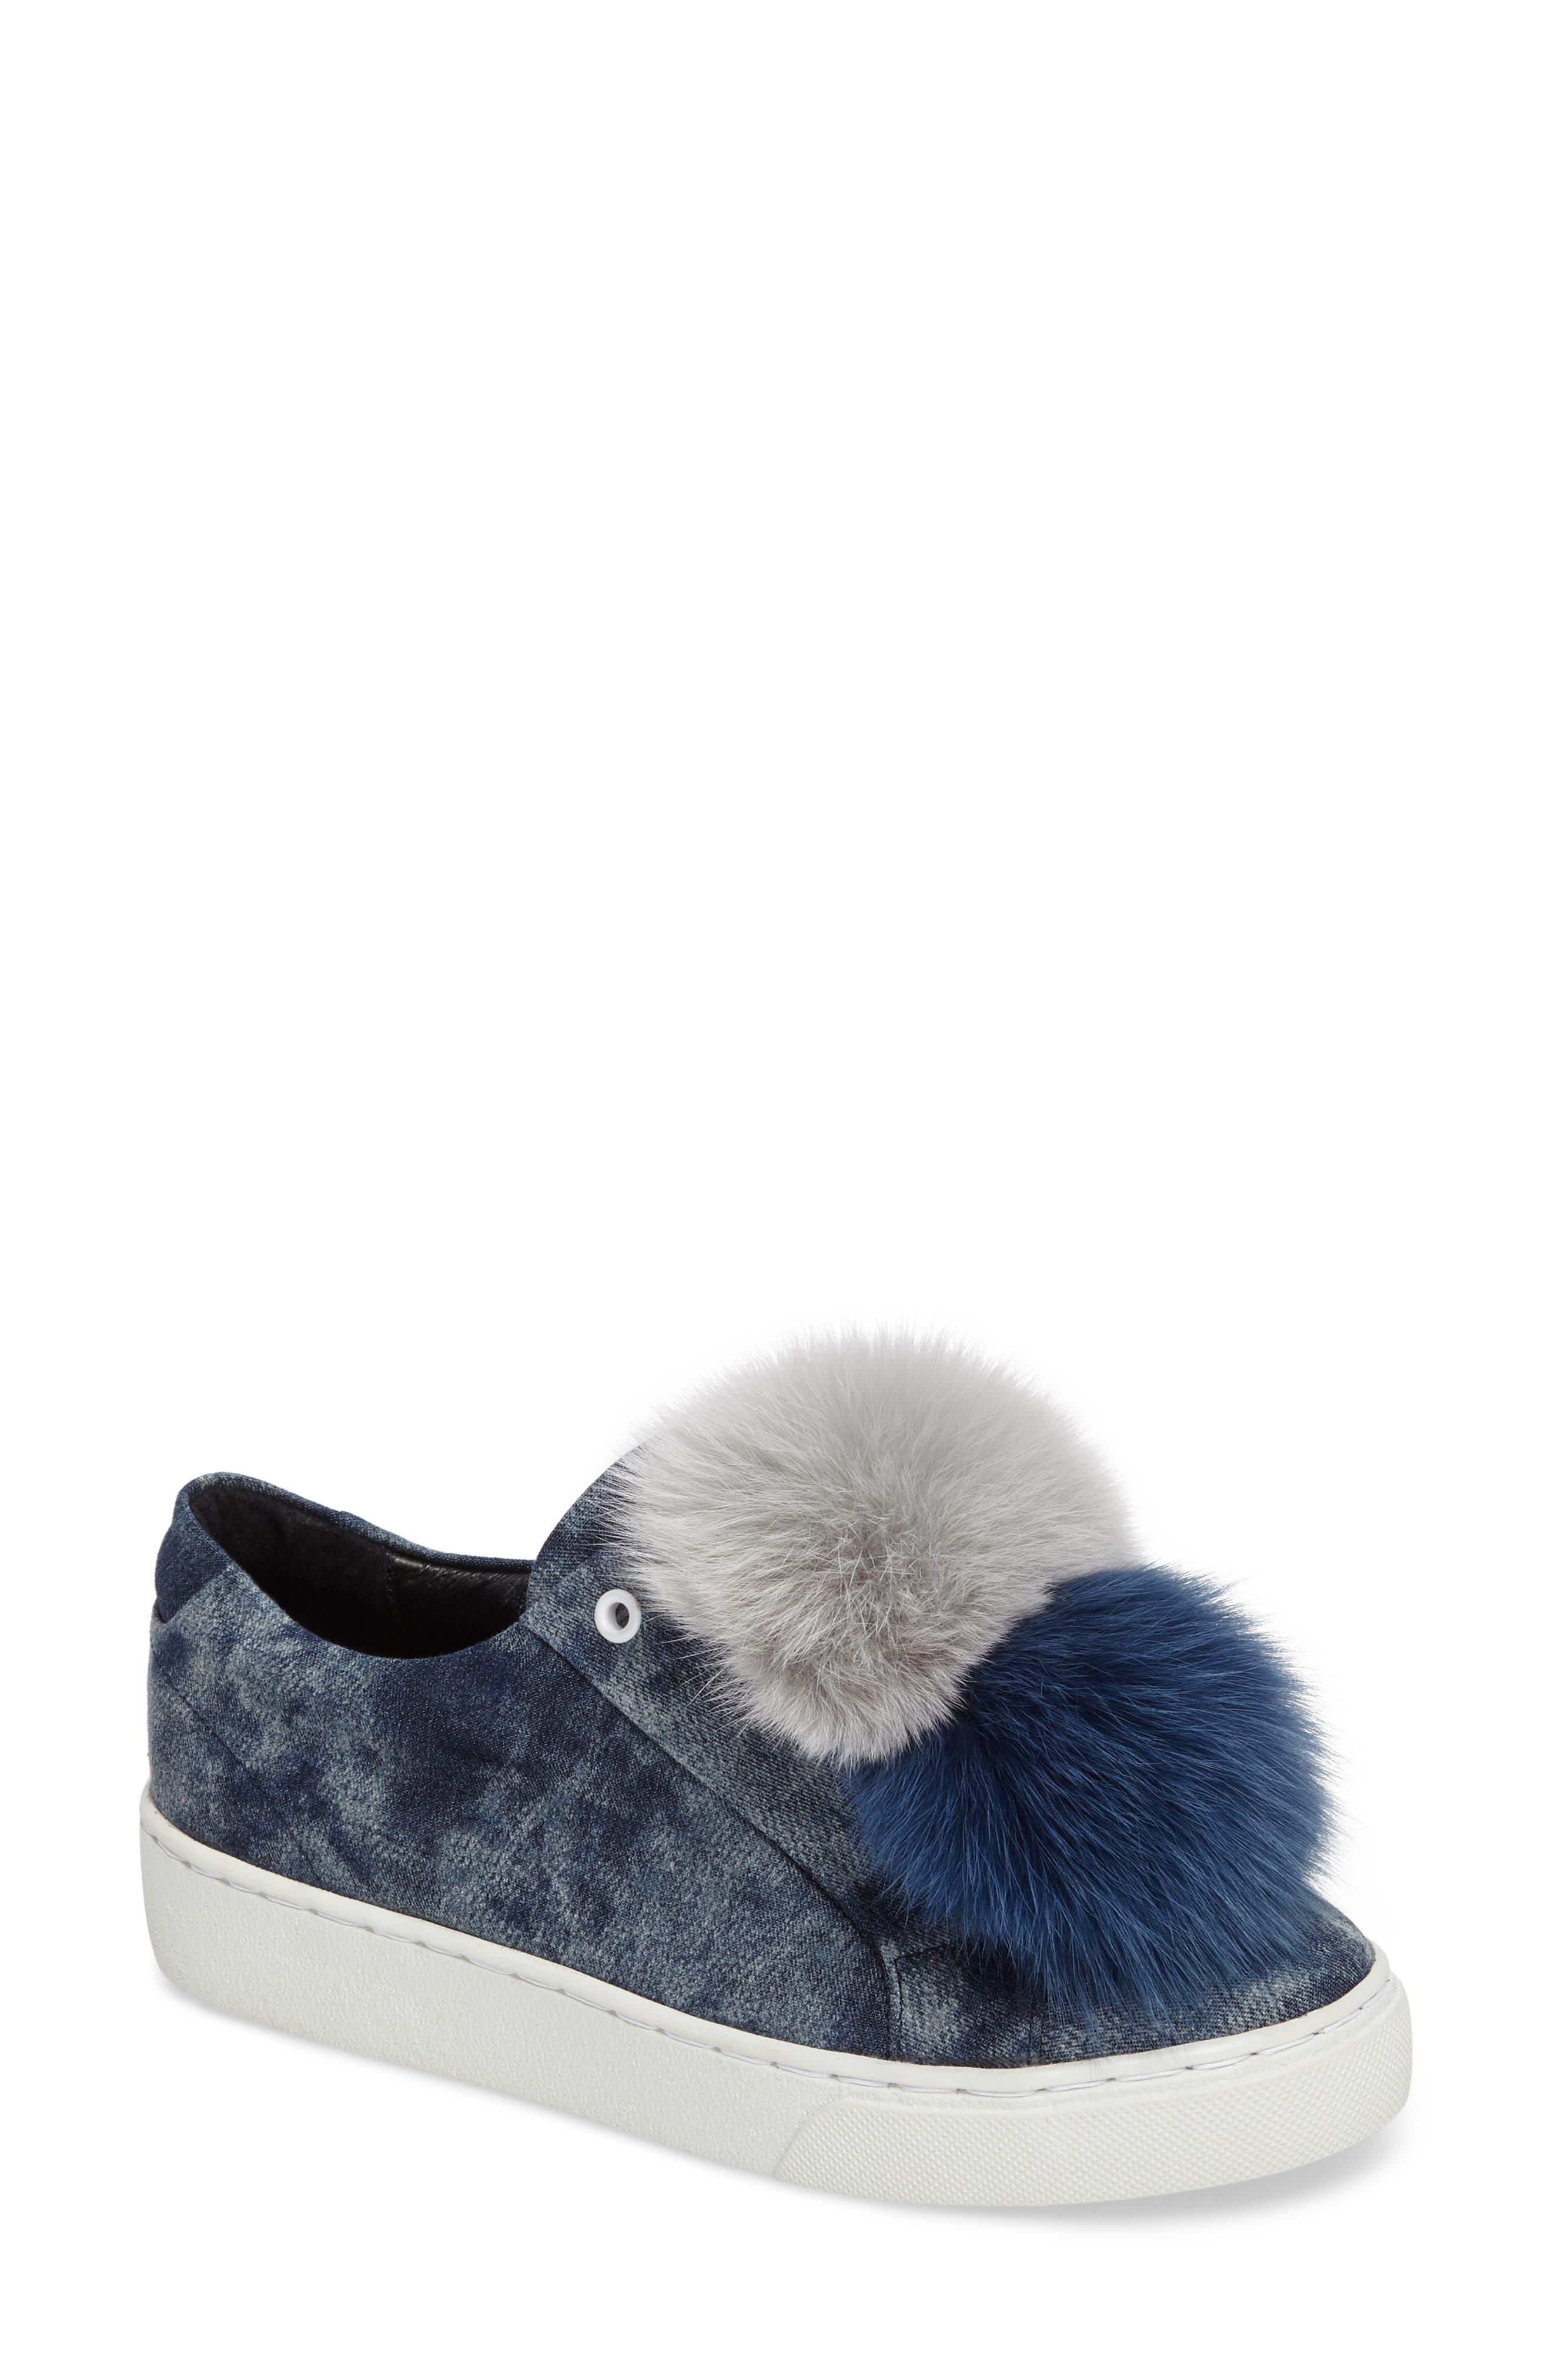 Joey Genuine Fox Fur Trim Sneaker,                             Main thumbnail 1, color,                             Blue Tiedye Denim